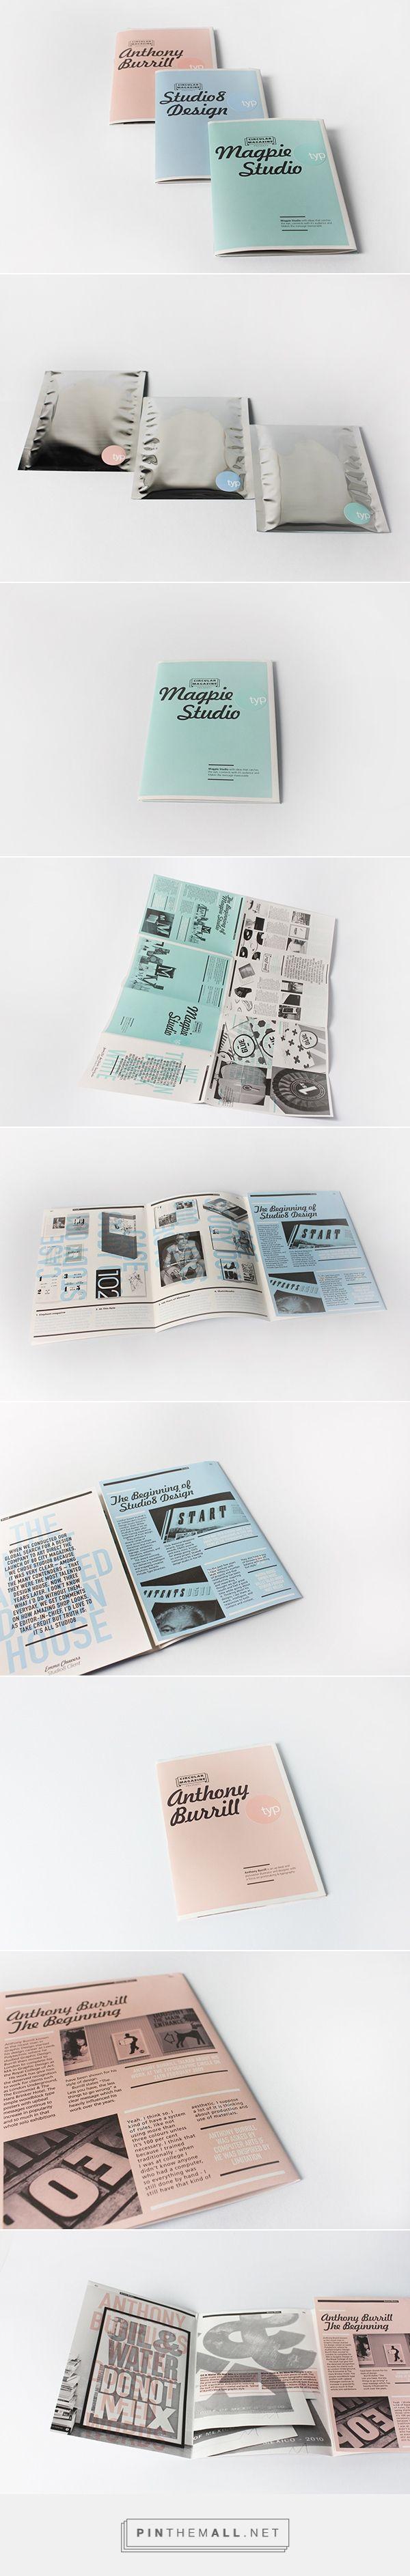 Circular Magazine Supplement by James Alexander